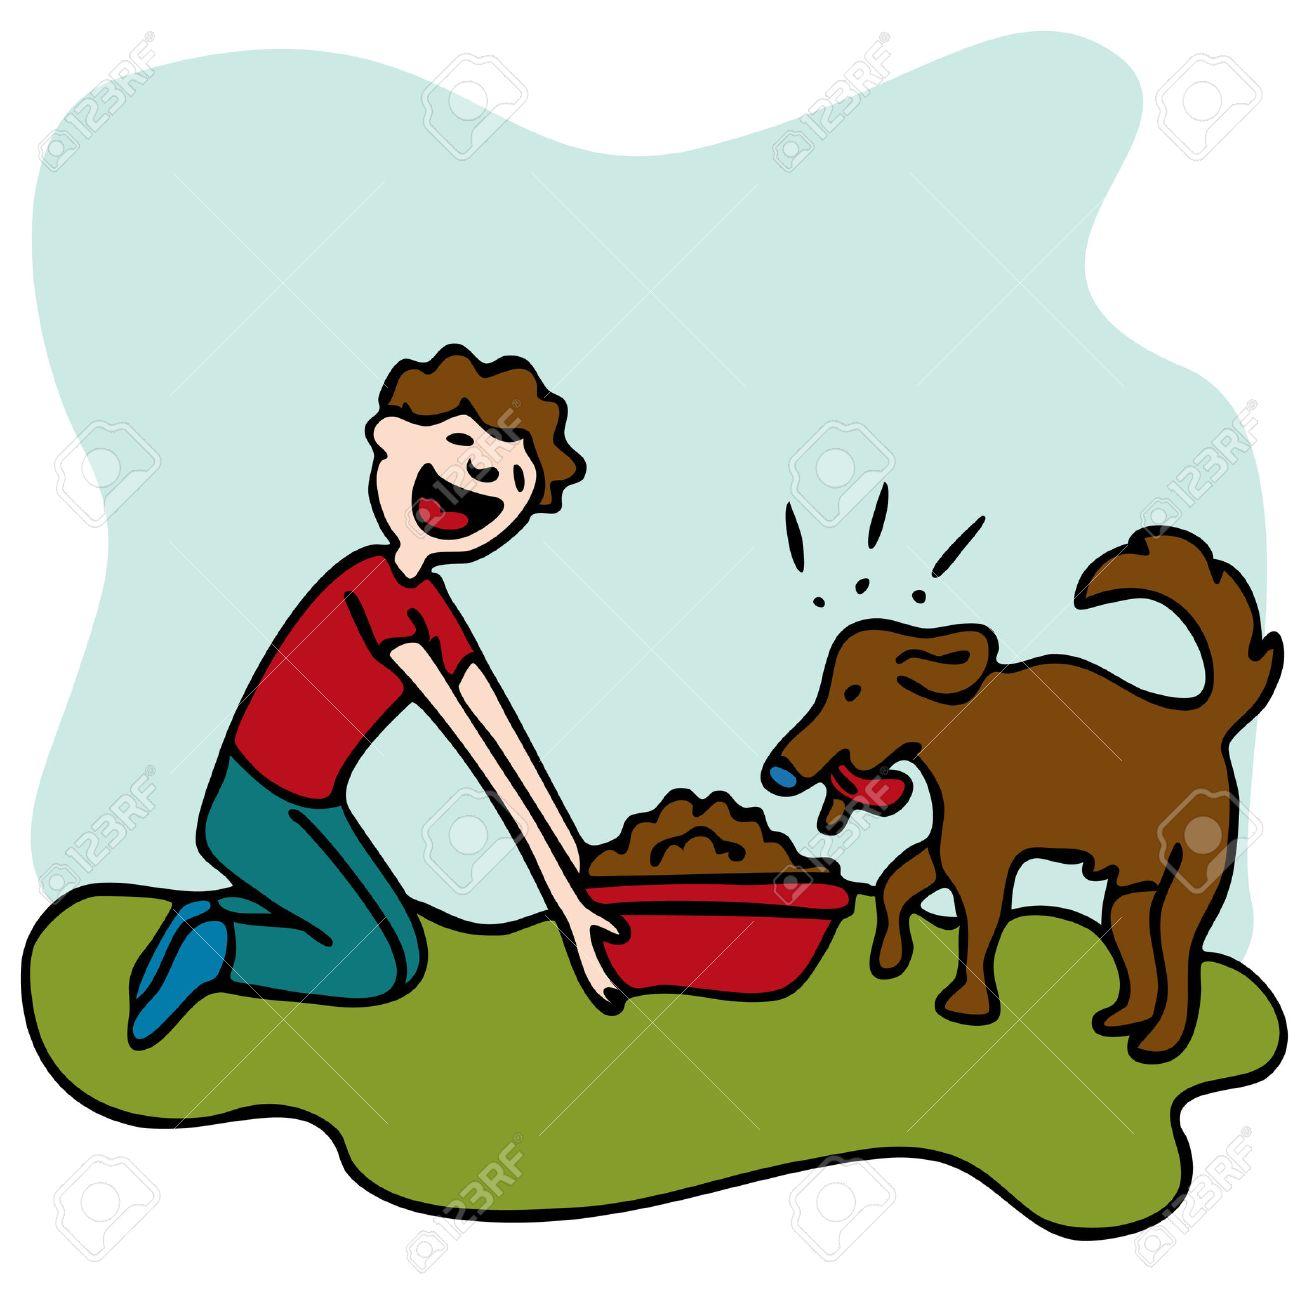 Resultado de imagen para feed the dog animado